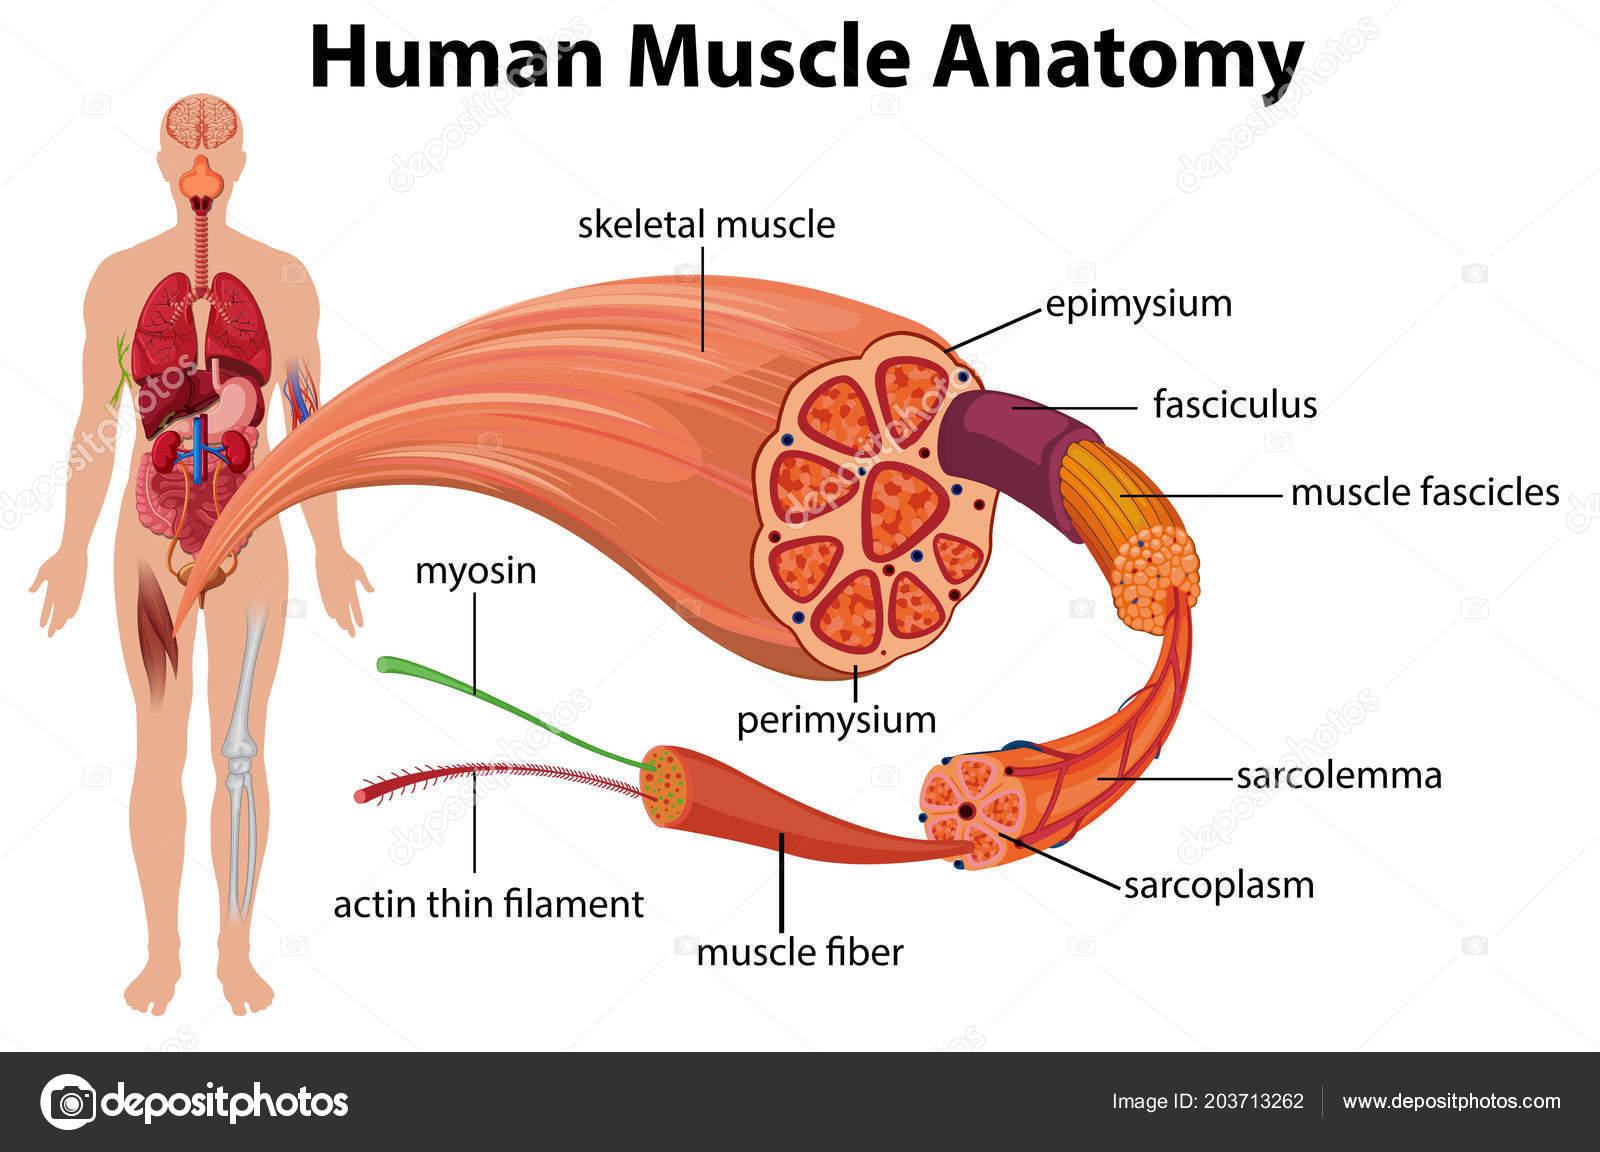 Human Muscle Anatomy Diagram Illustration — Stock Vector ...